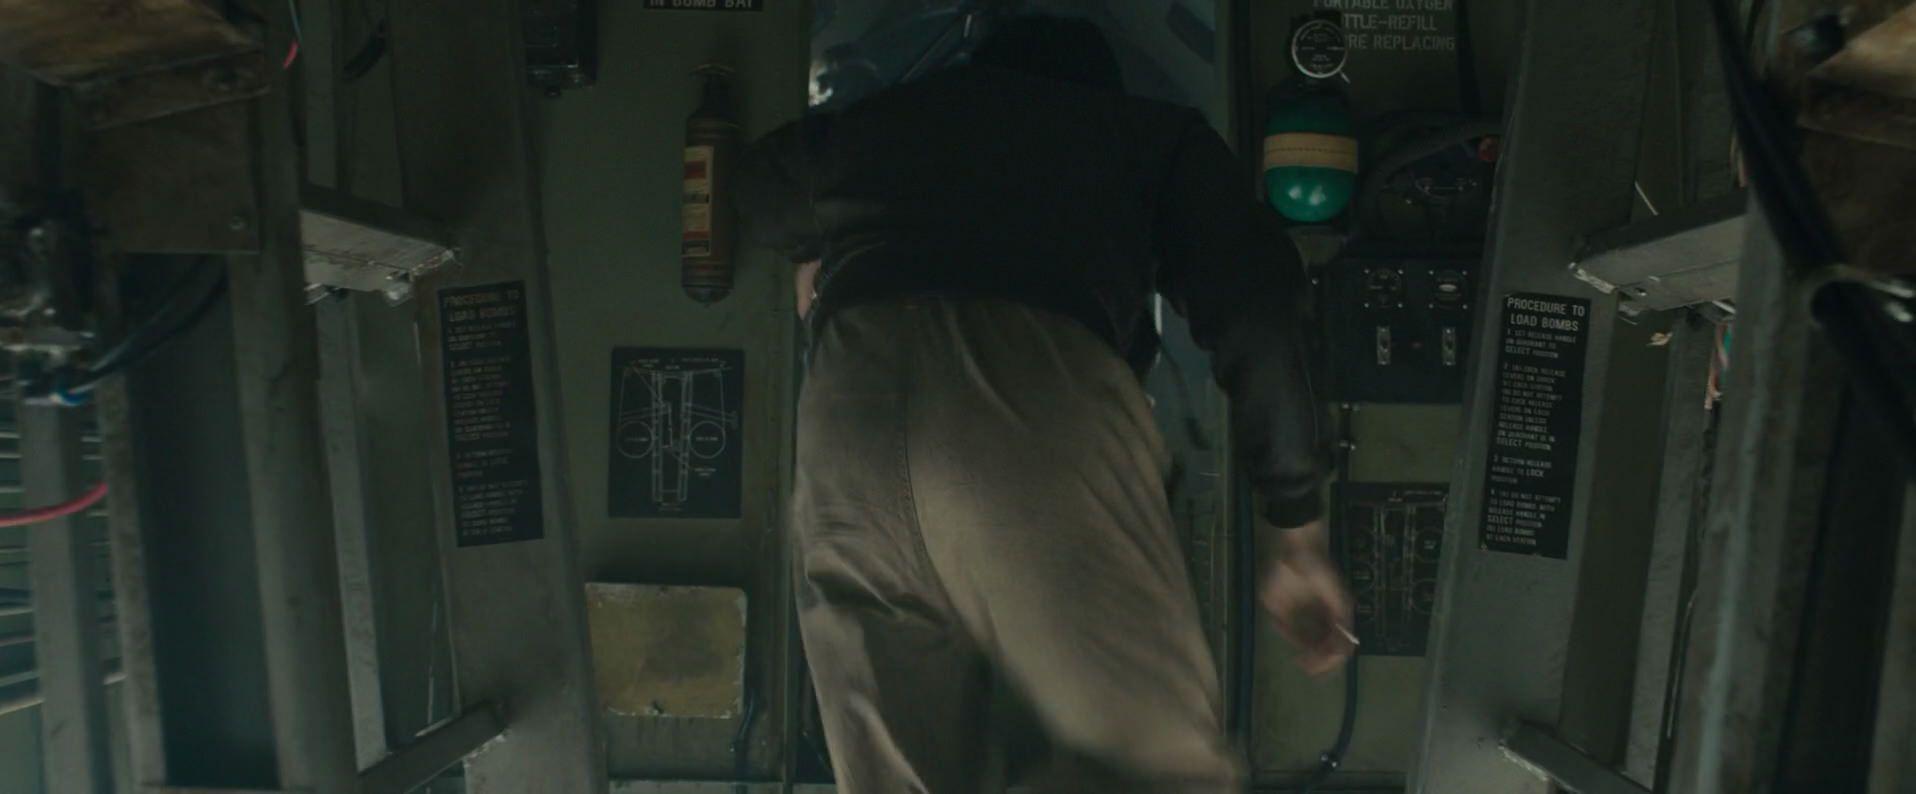 unbroken-movie-screencaps.com-550.jpg